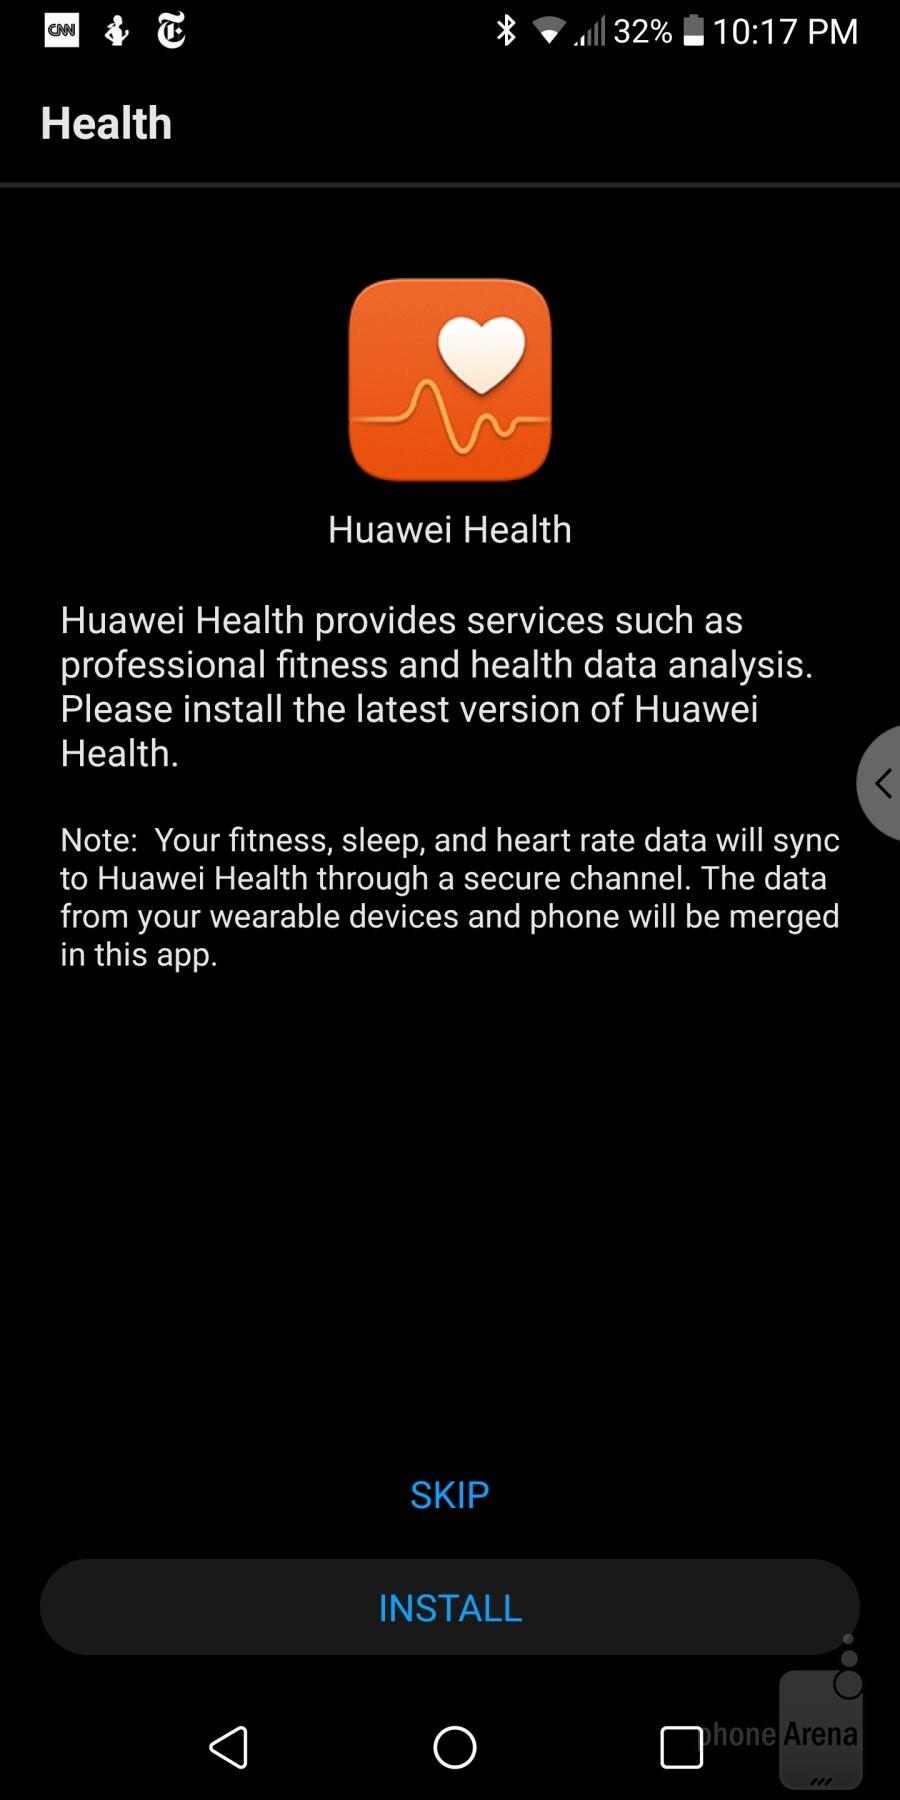 The Huawei Health  app